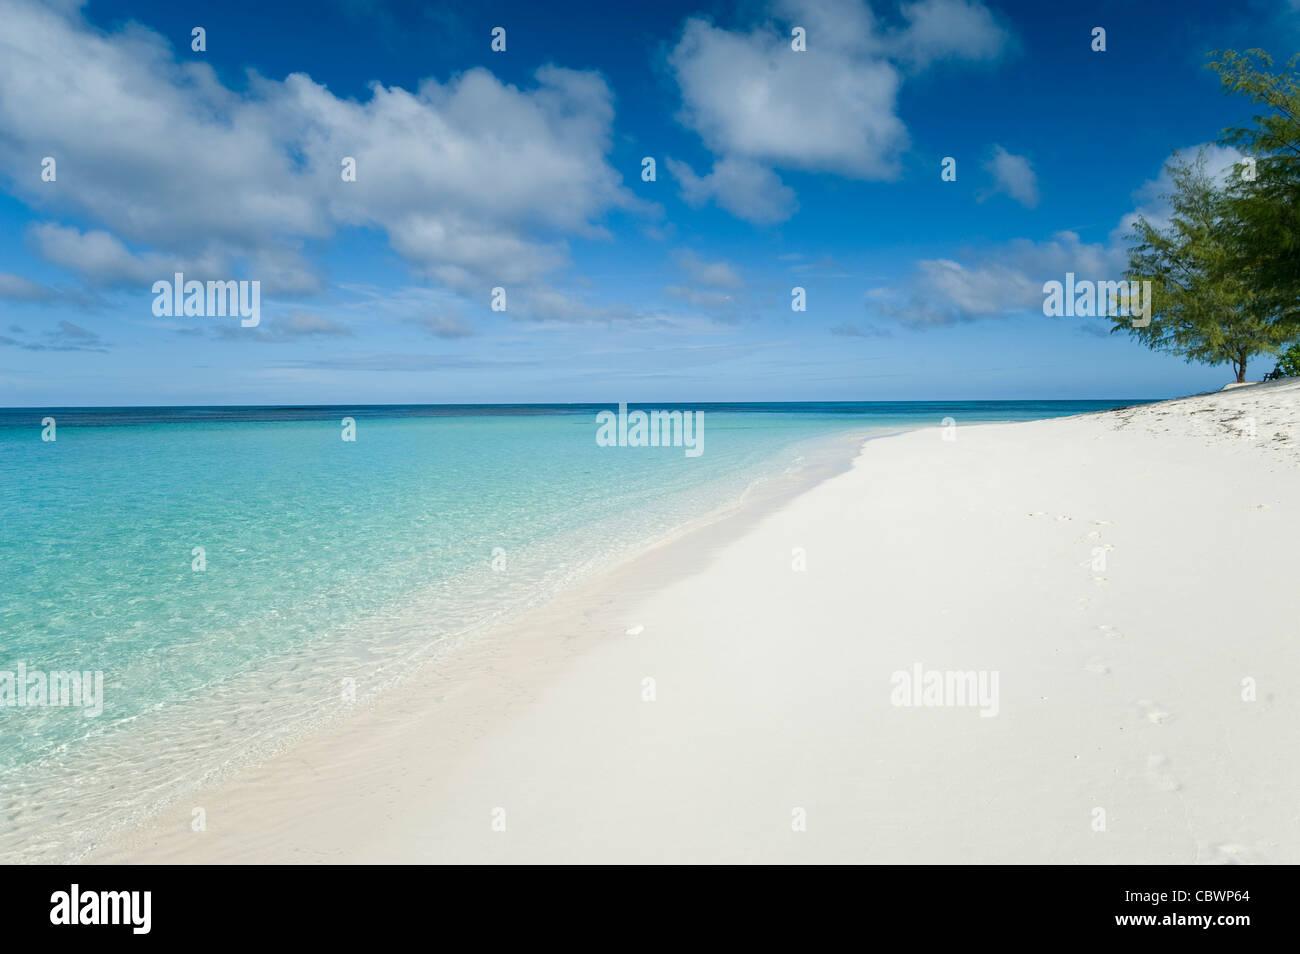 Denis private island, Seychelles - Stock Image